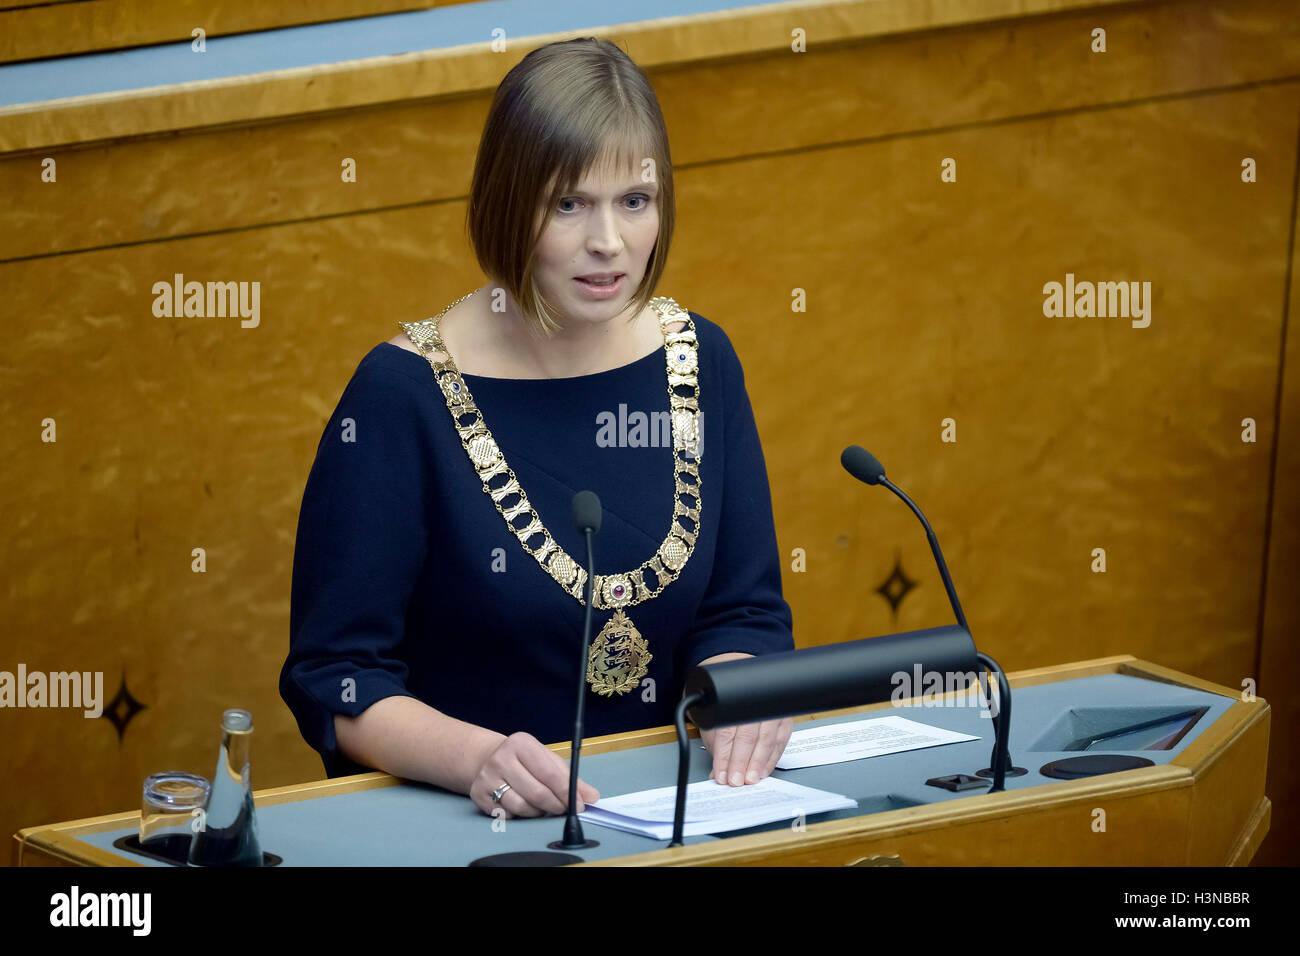 Tallinn, Estonia. 10th Oct, 2016. Estonia's newly-elected President Kersti Kaljulaid delivers her first speech - Stock Image